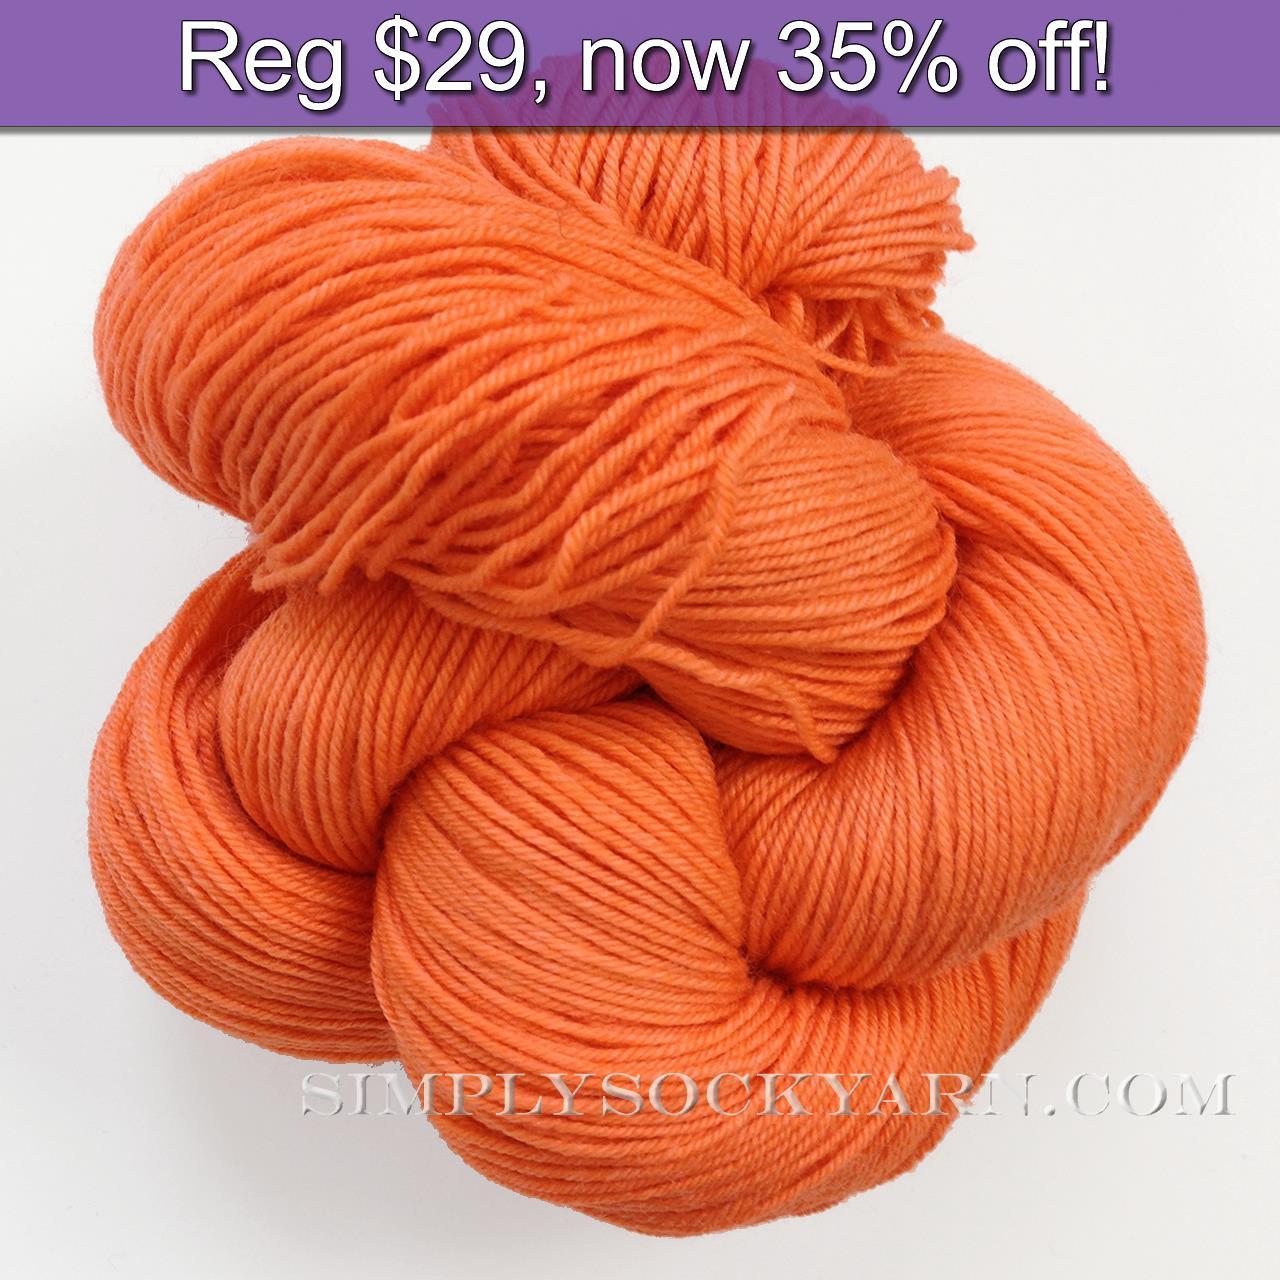 LL Sock Solid Carrot -